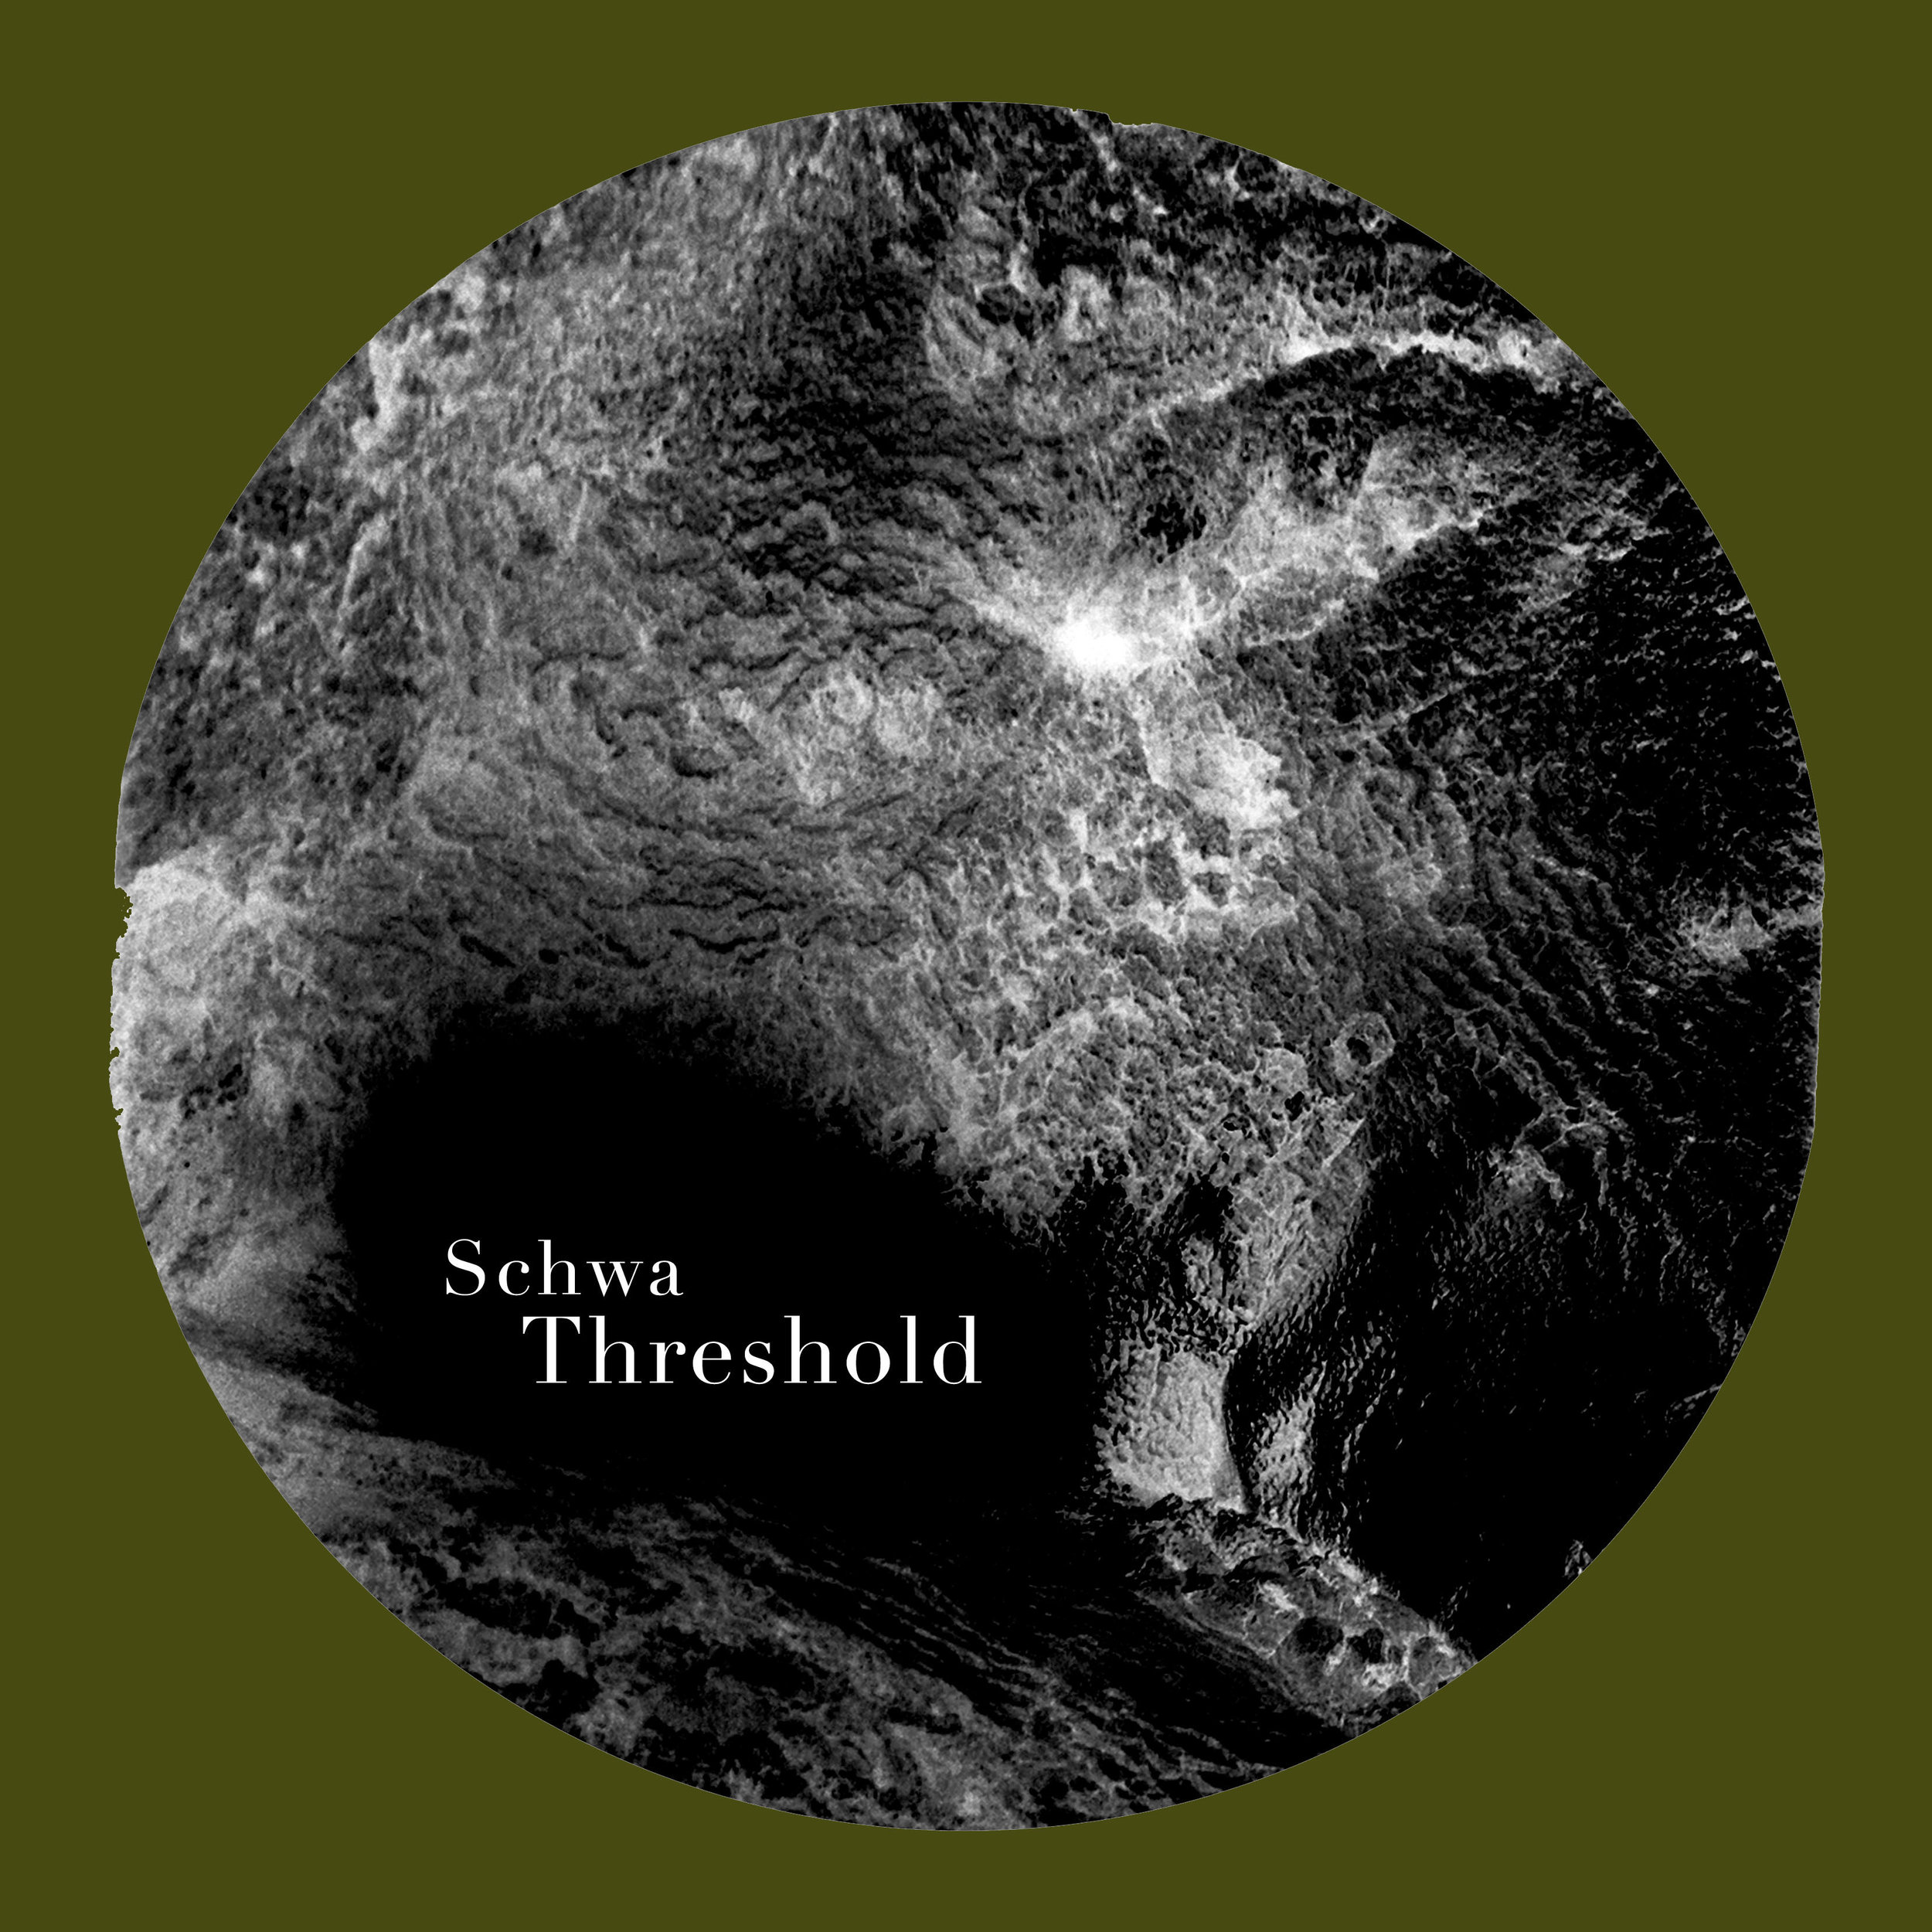 Thresh CD sludge.jpg